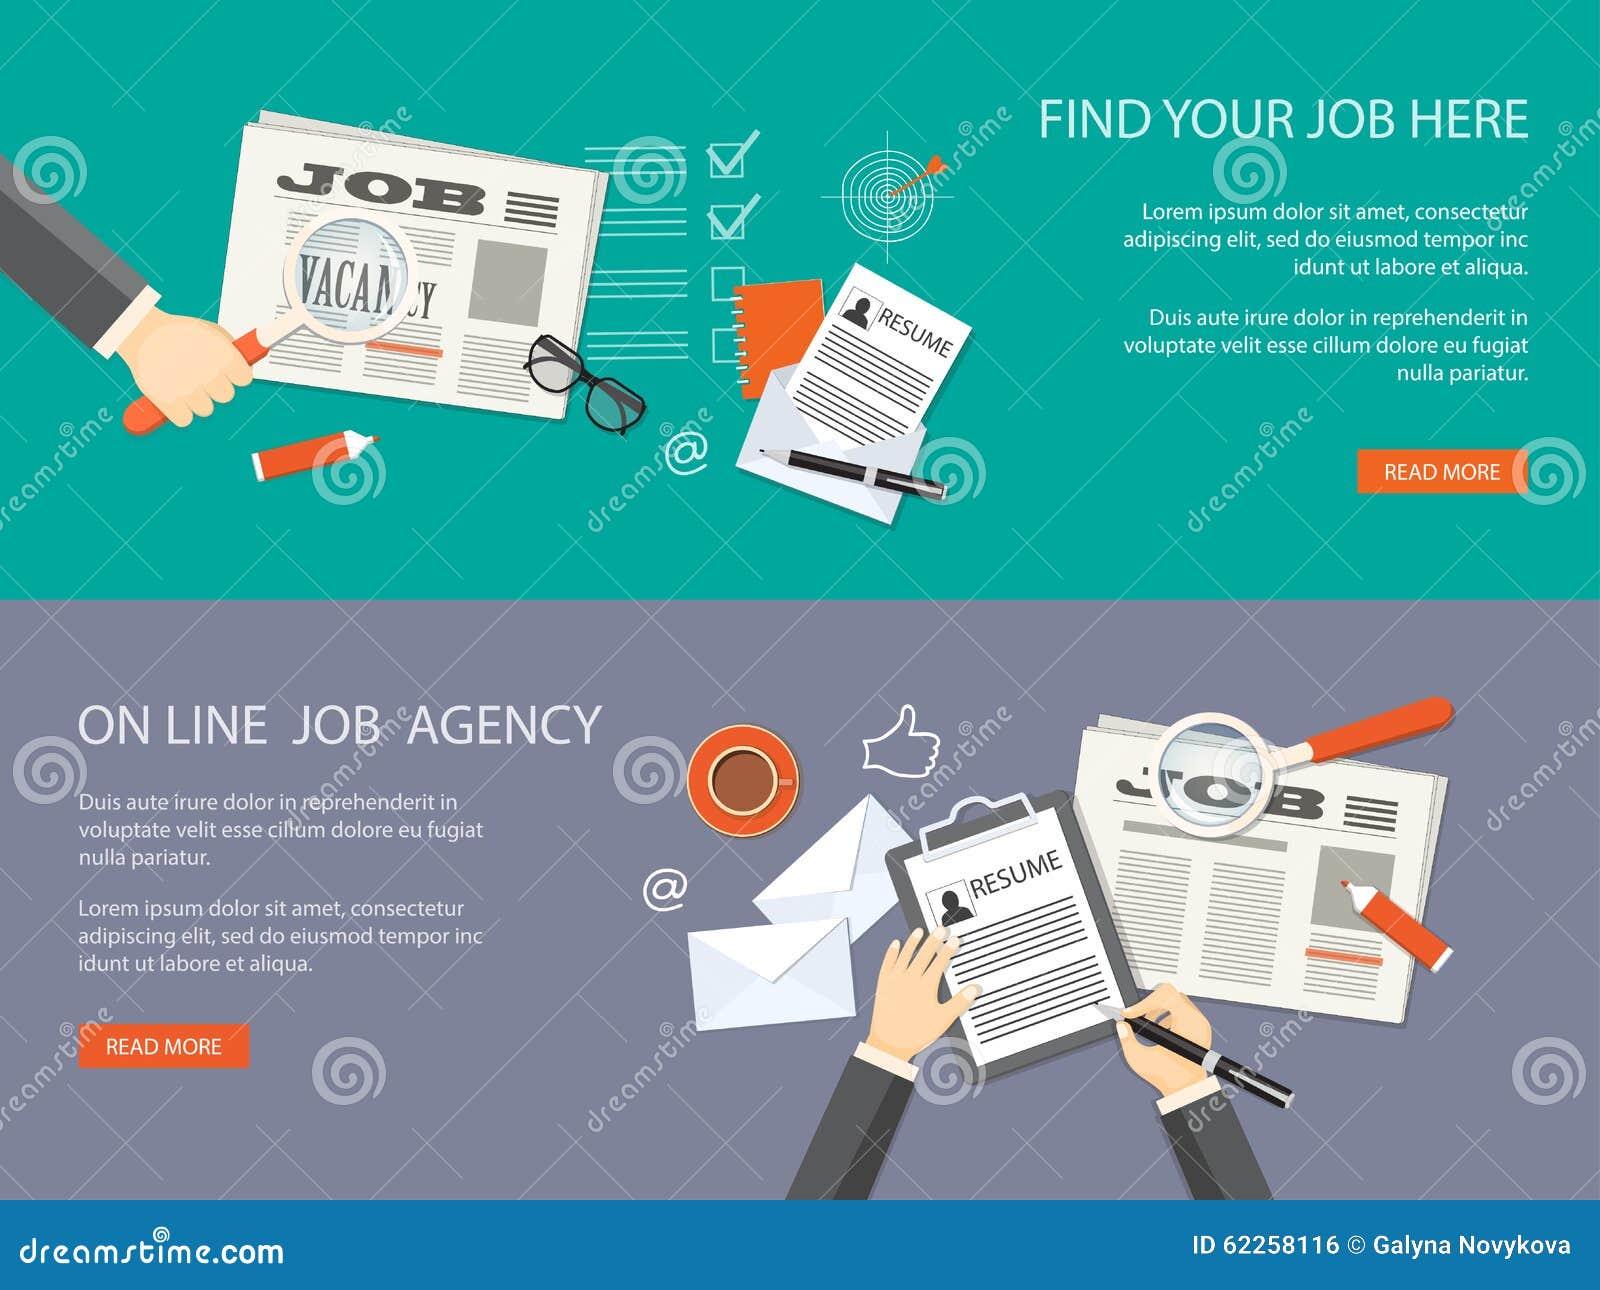 Free hand job site